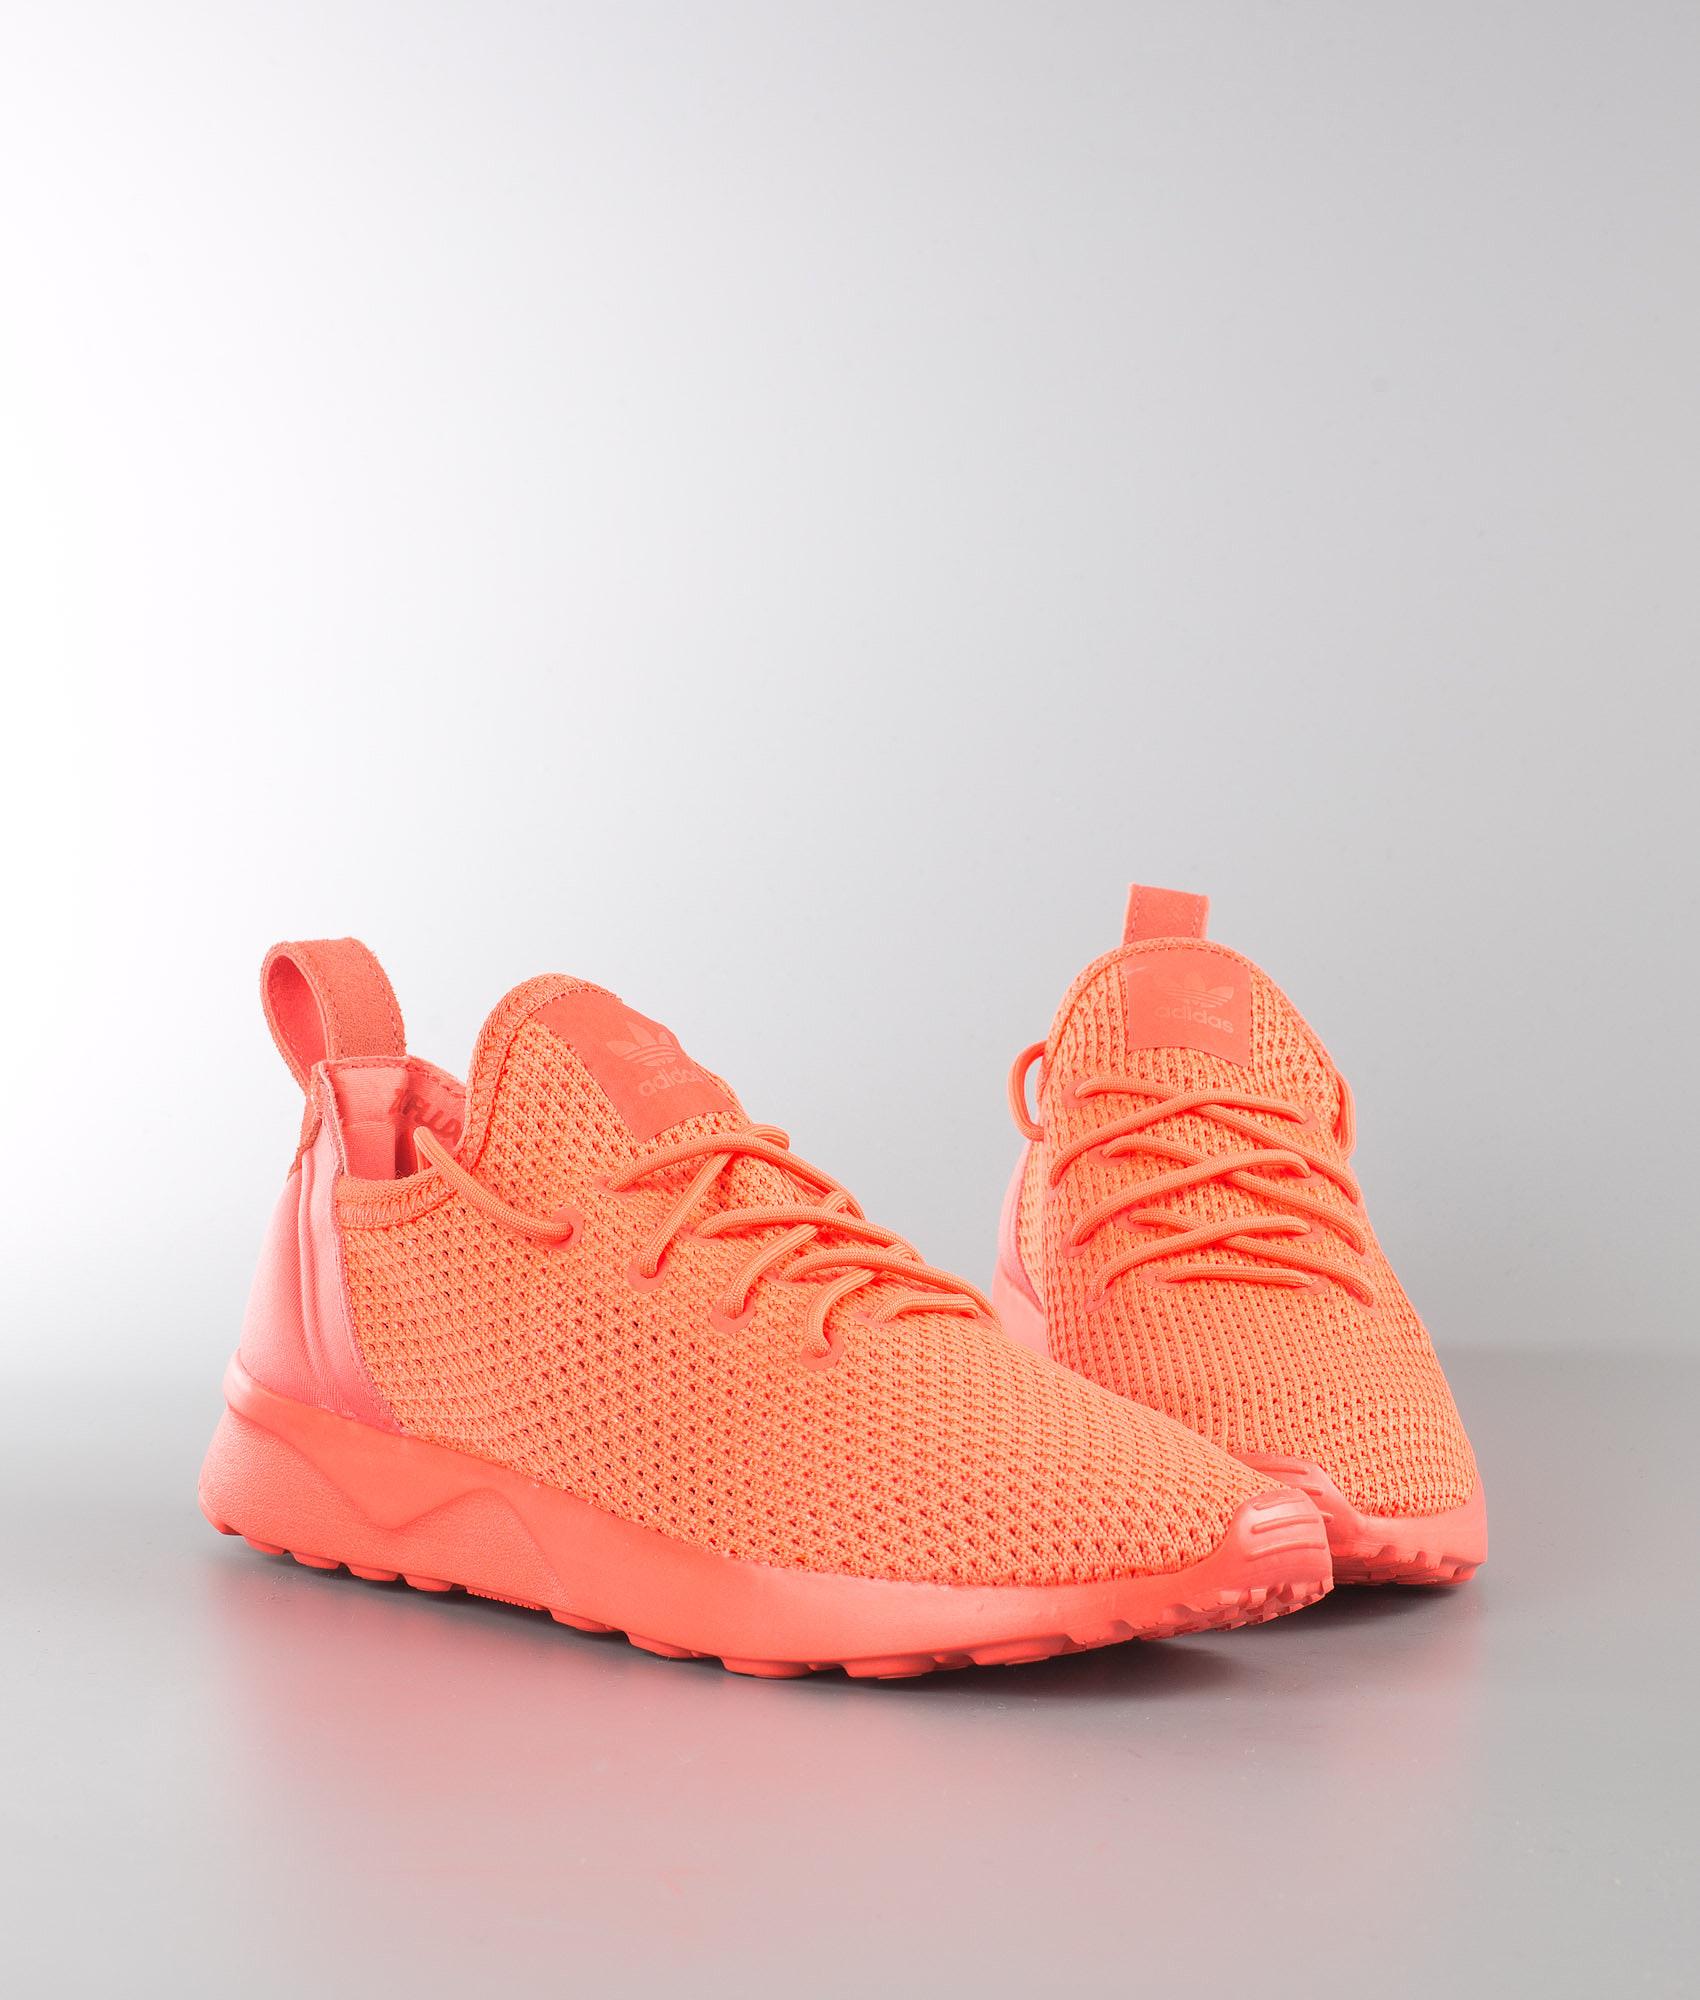 16fa773d7 Adidas Originals Zx Flux Adv Virtue Shoes Eascor Eascor Eascor ...